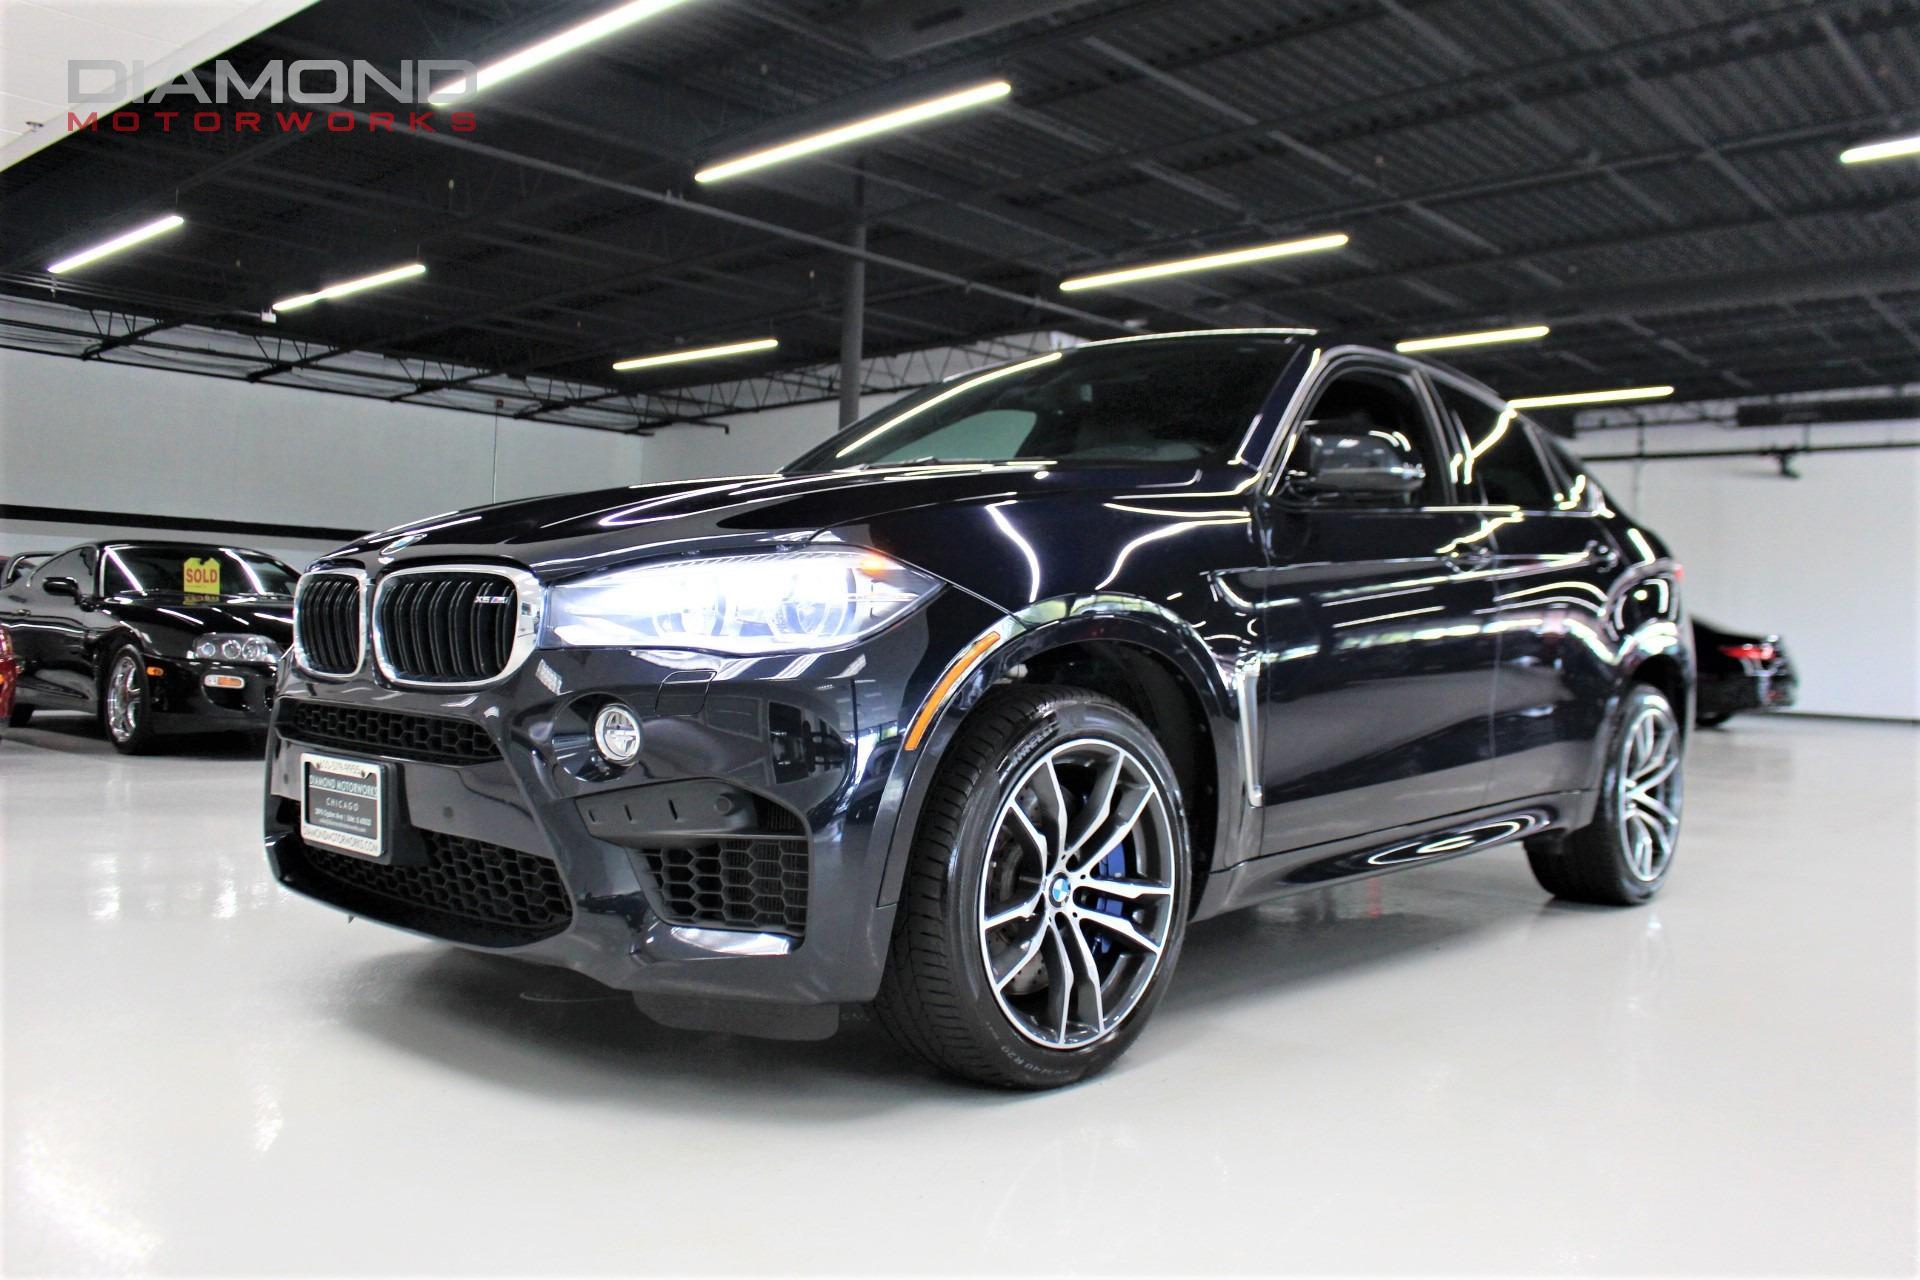 2016 Bmw X6 M Stock R43089 For Sale Near Lisle Il Il Bmw Dealer